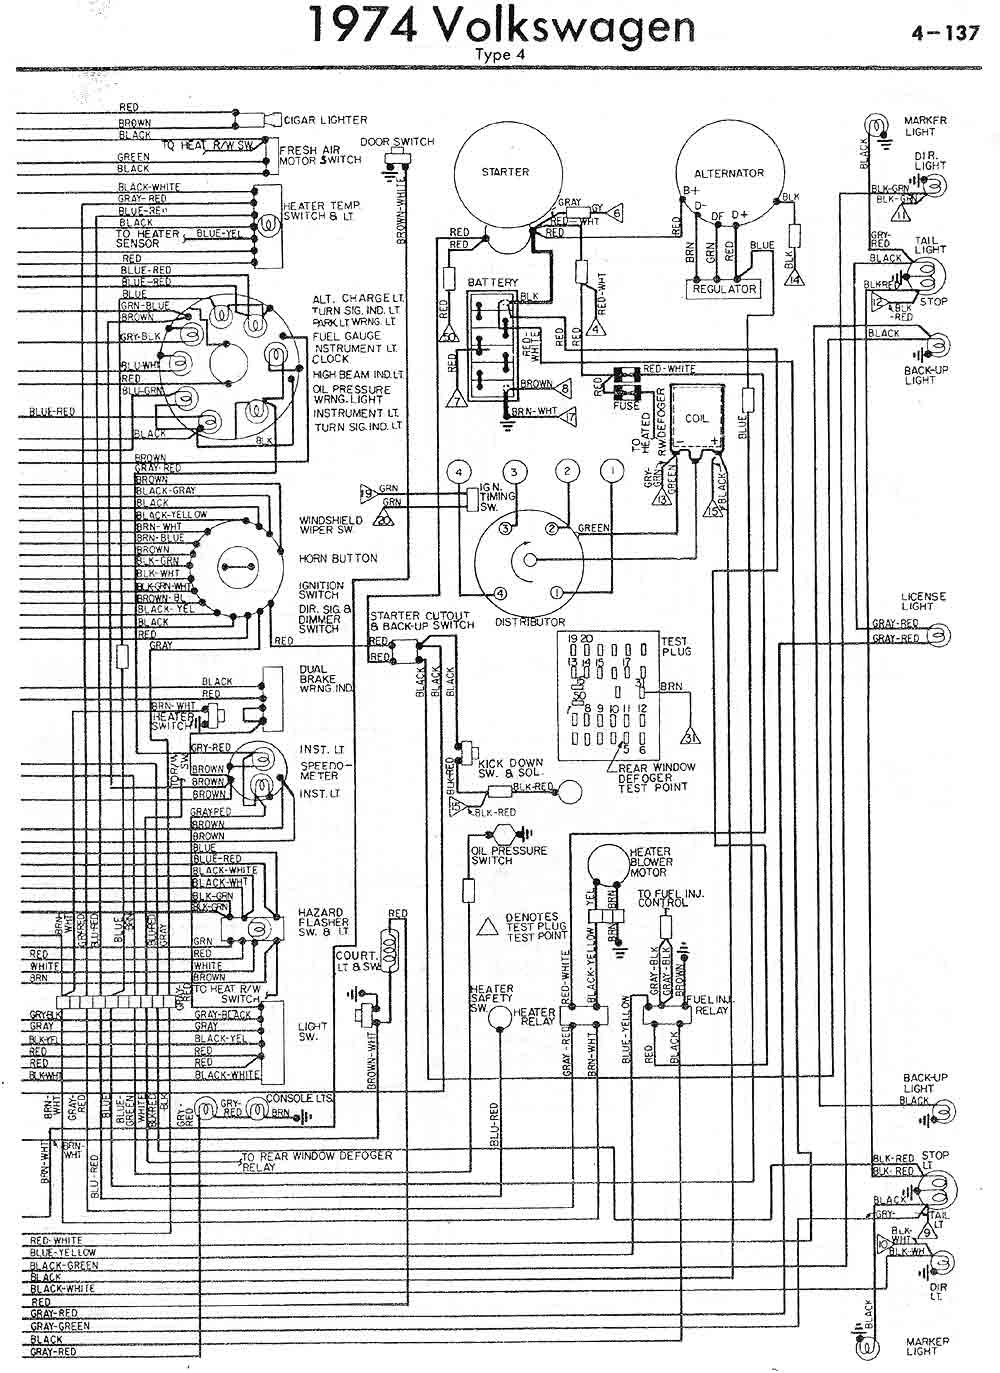 Wiring Diagrams Volkswagen Up Diagram Us Model 412 Year 1974 Part 2